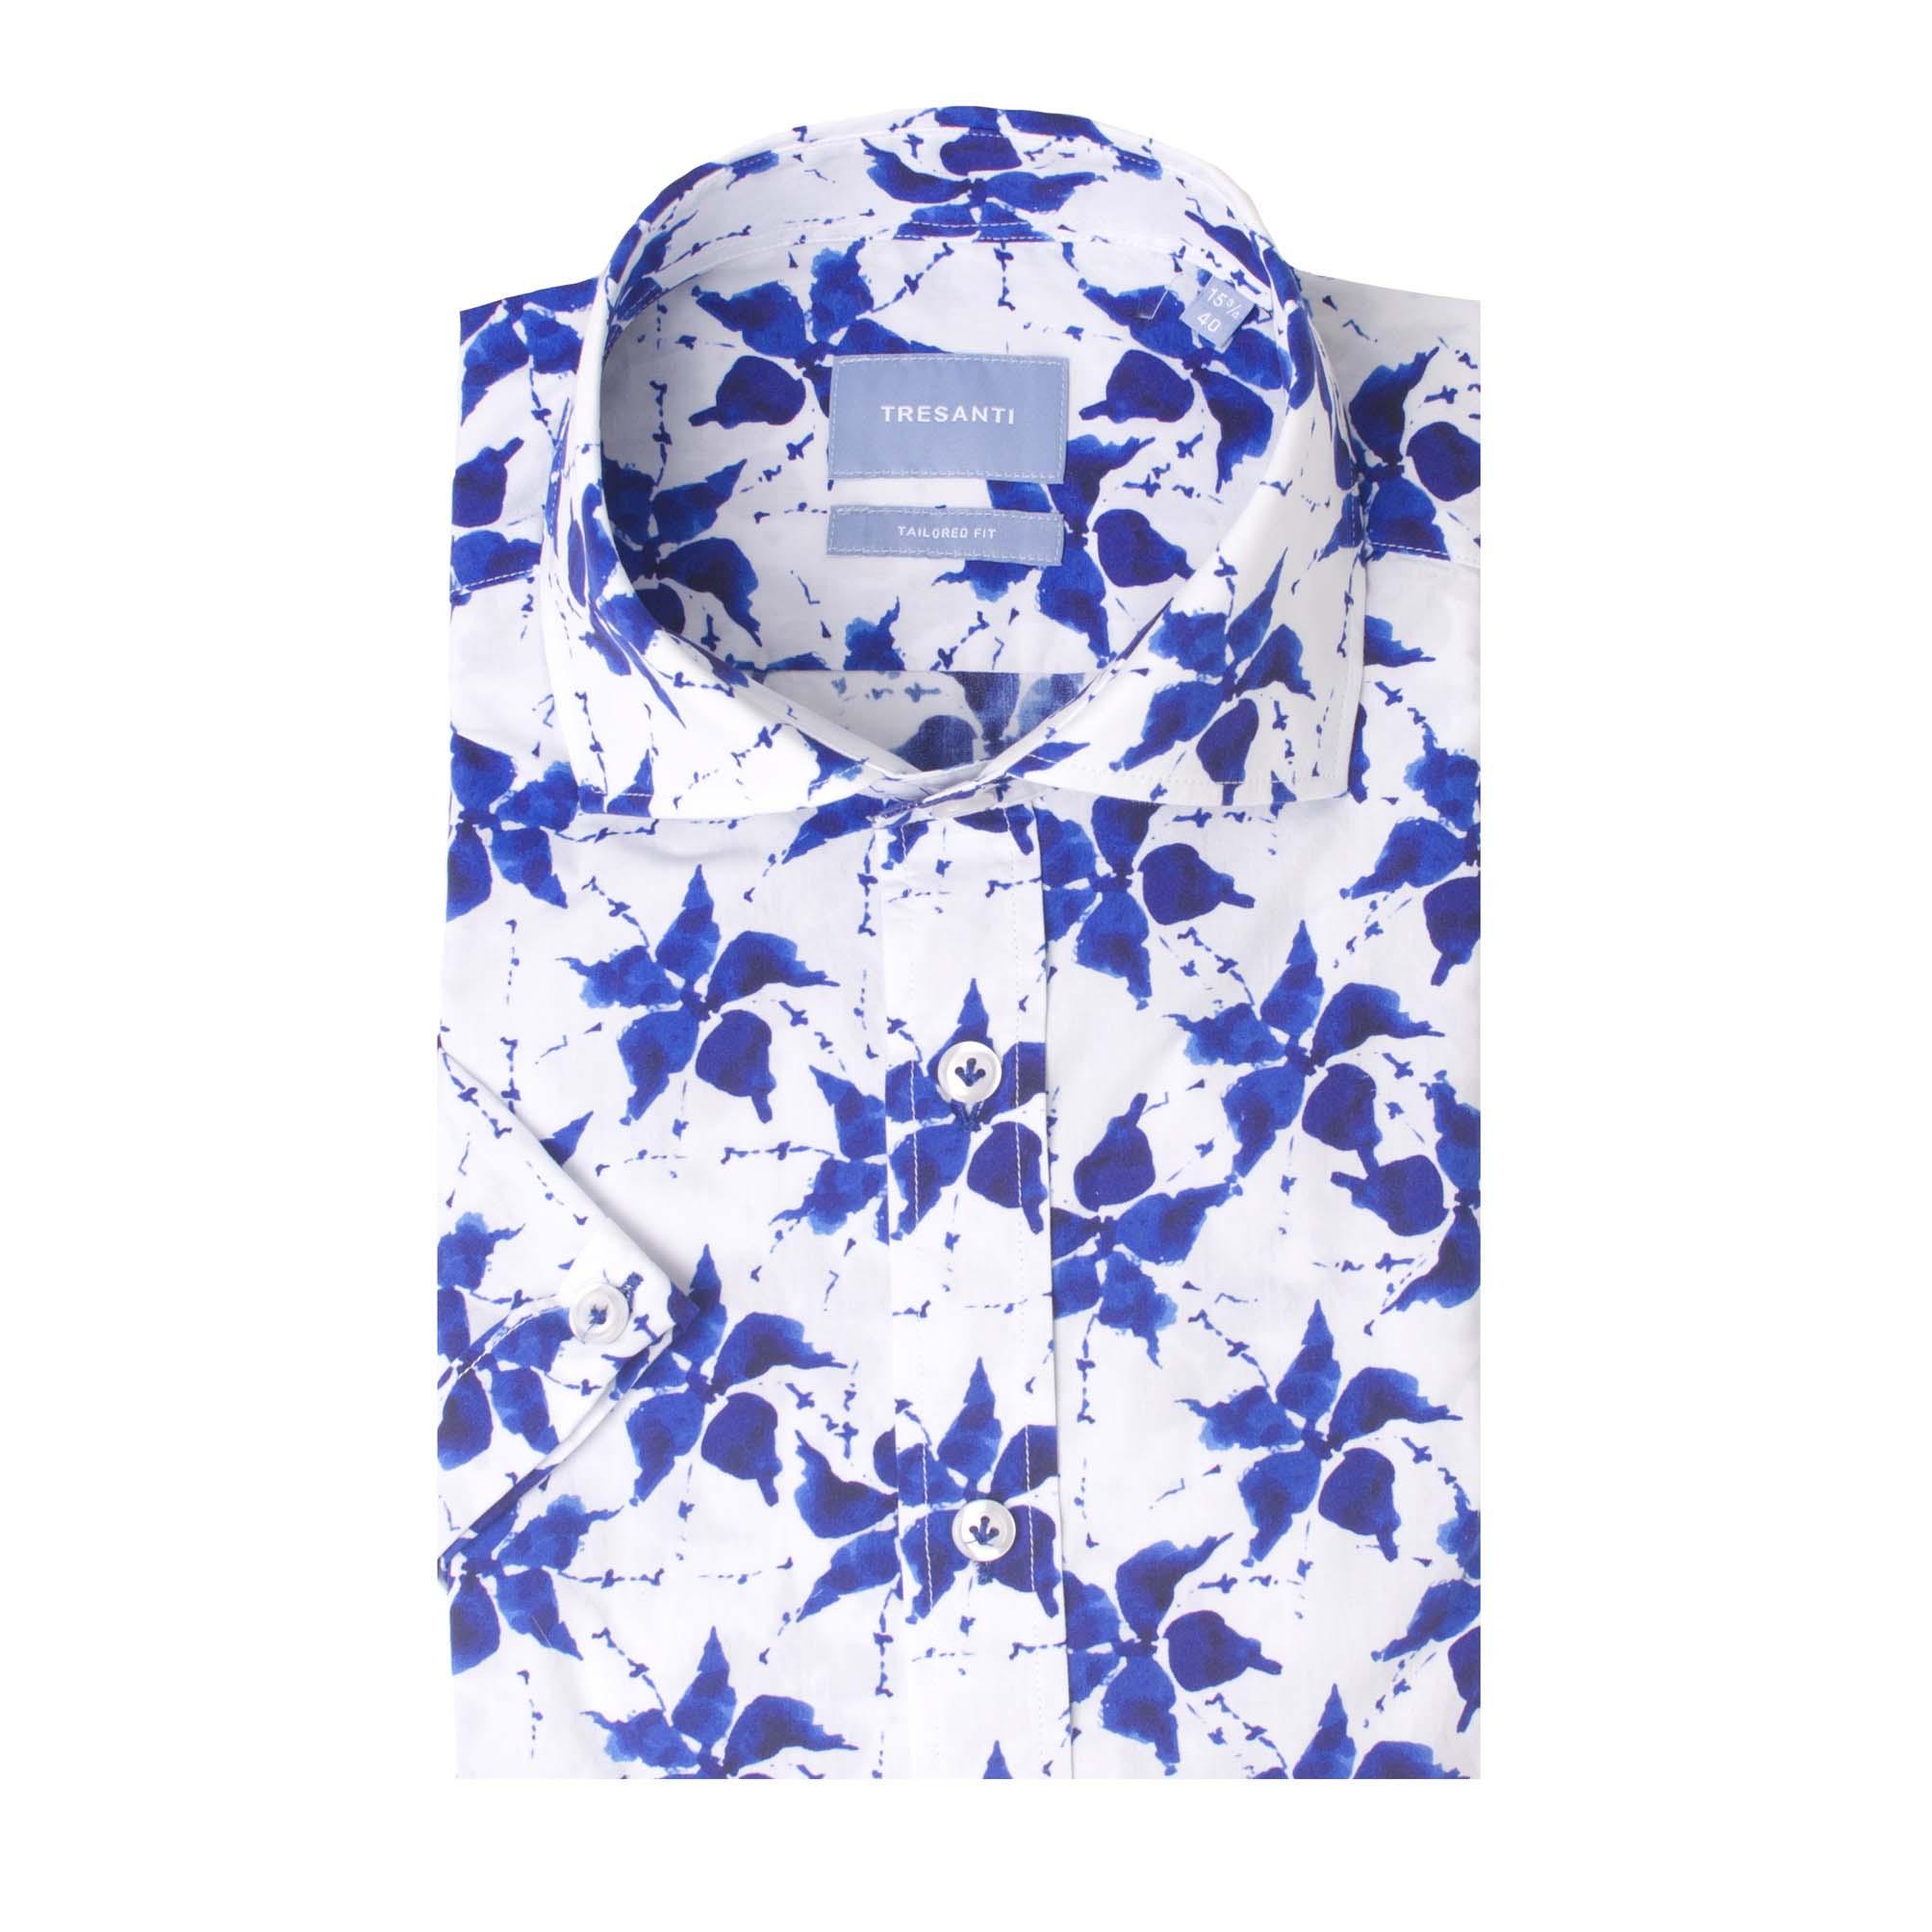 Tygo | Shirt flower print blue | SS